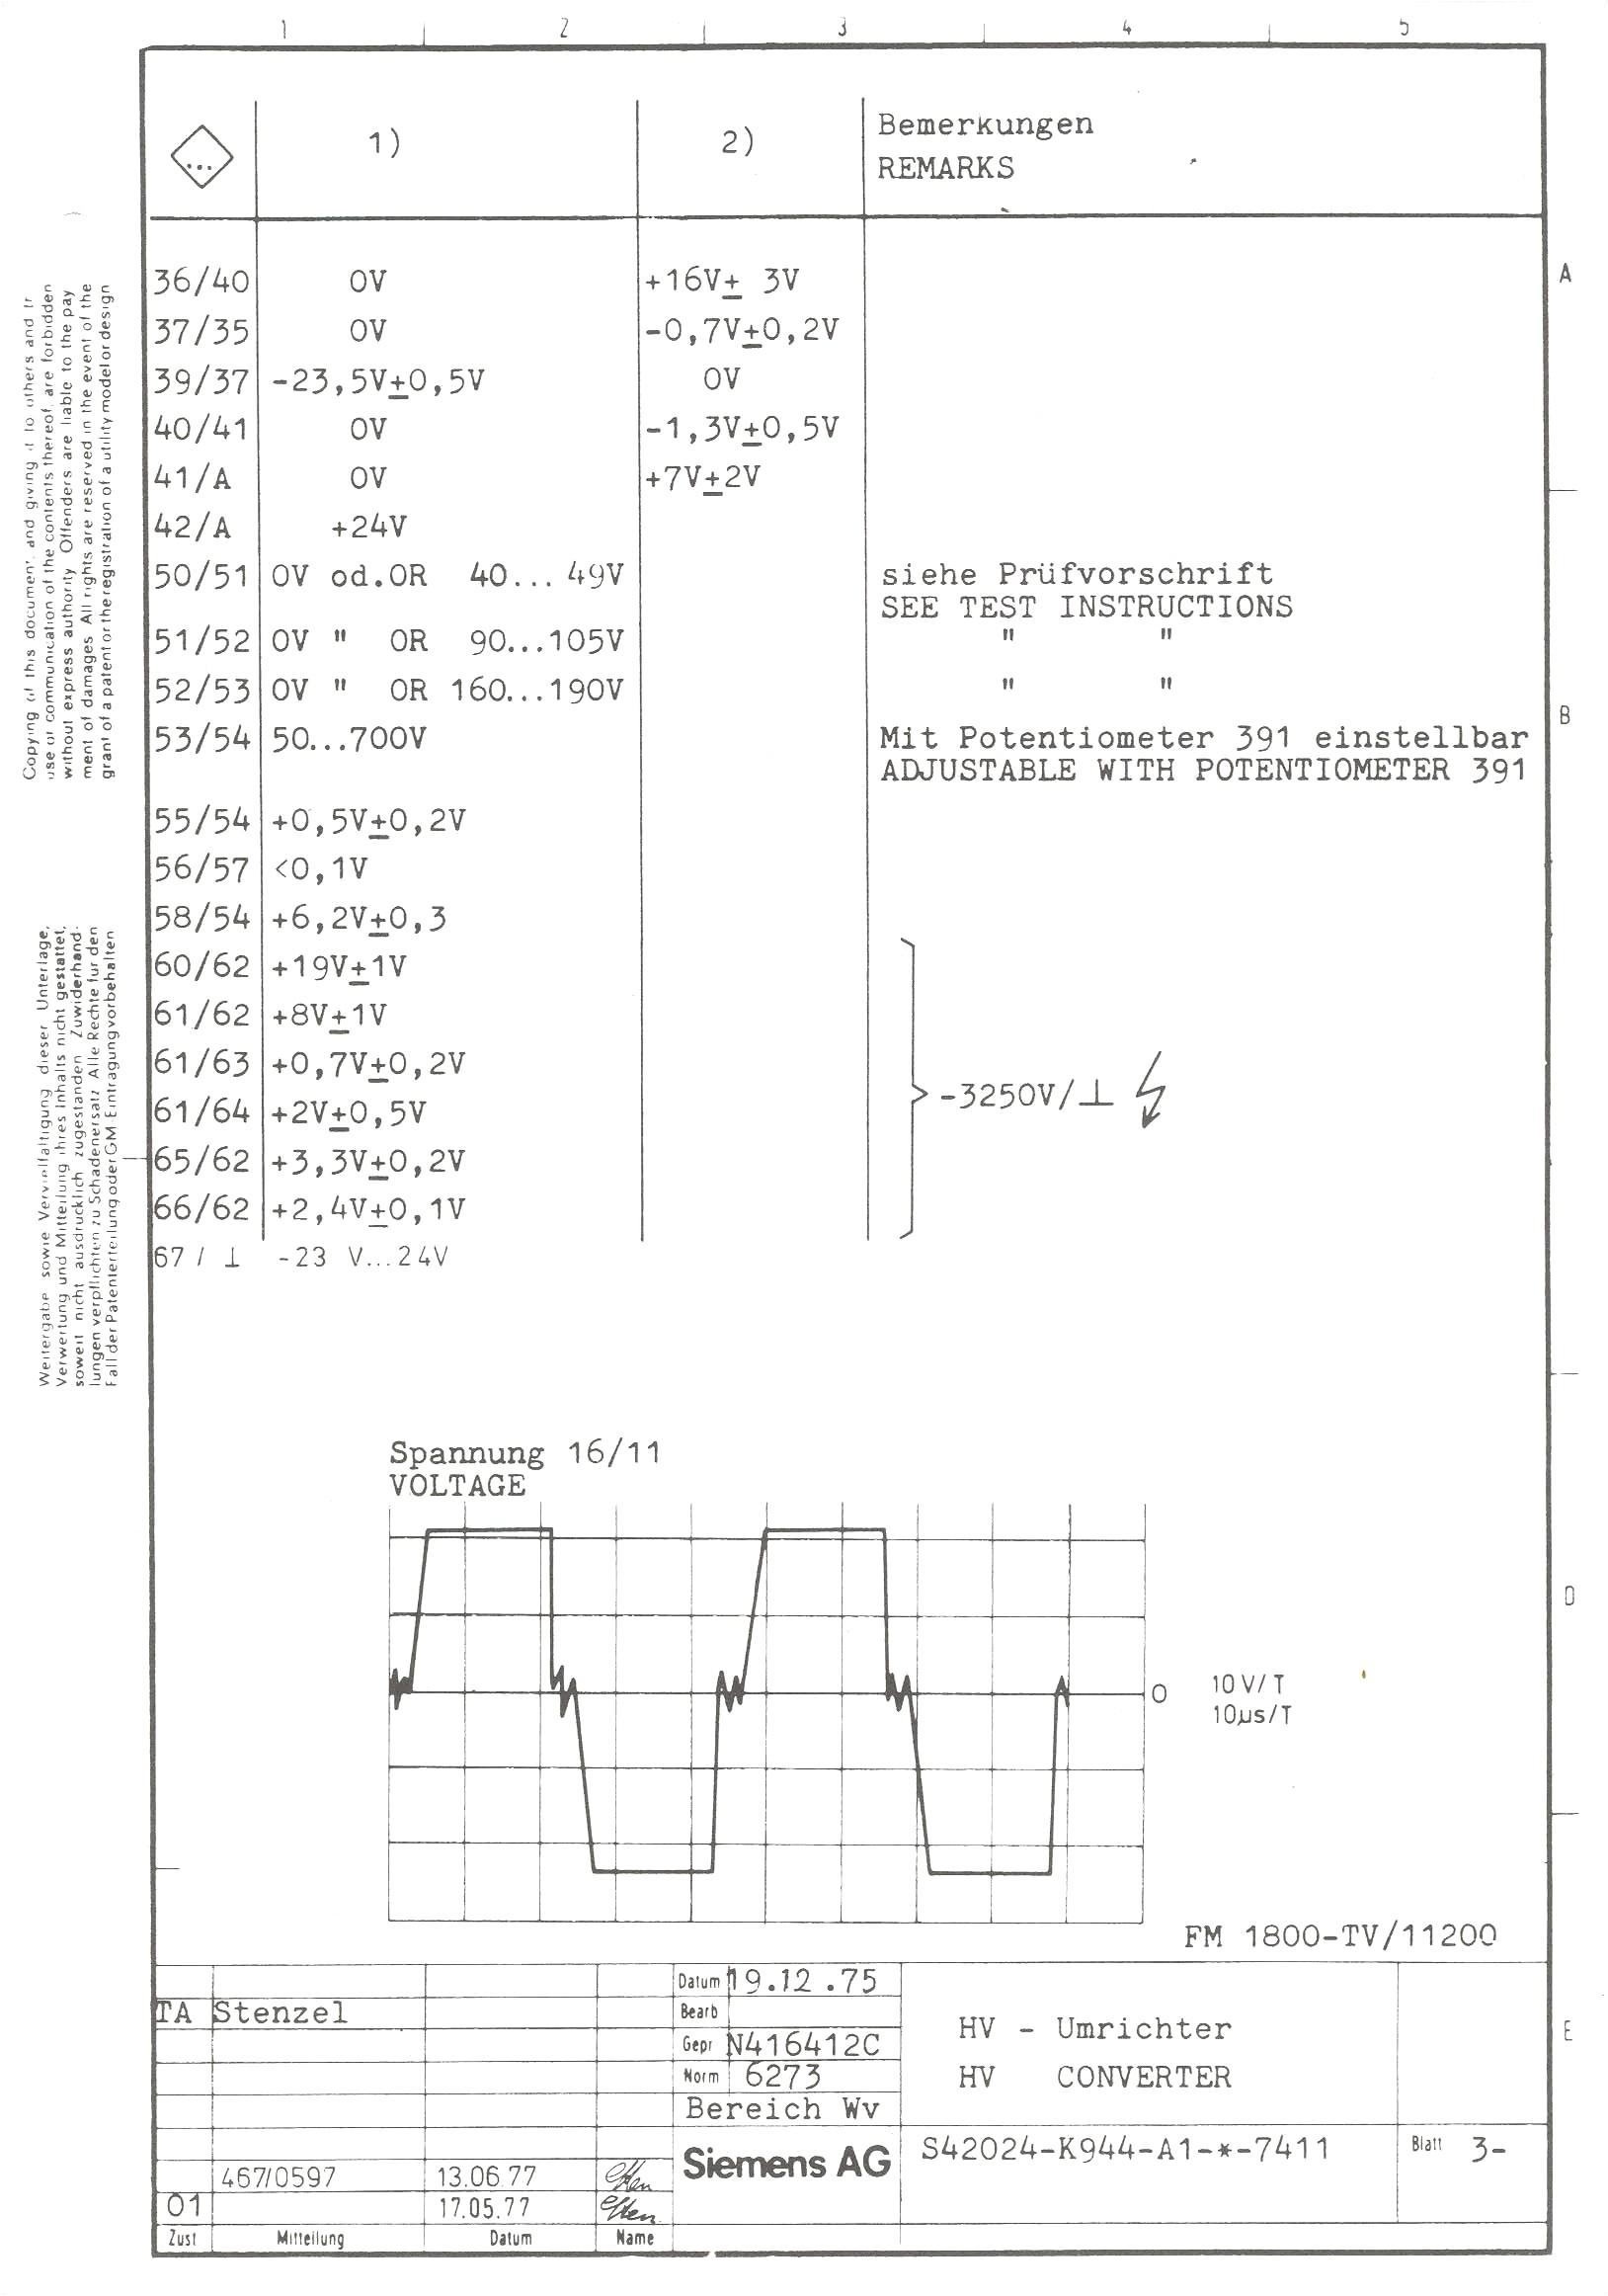 wiring diagram 5 channel 13 kicker wiring diagram datasource wiring diagram 5 channel 13 kicker